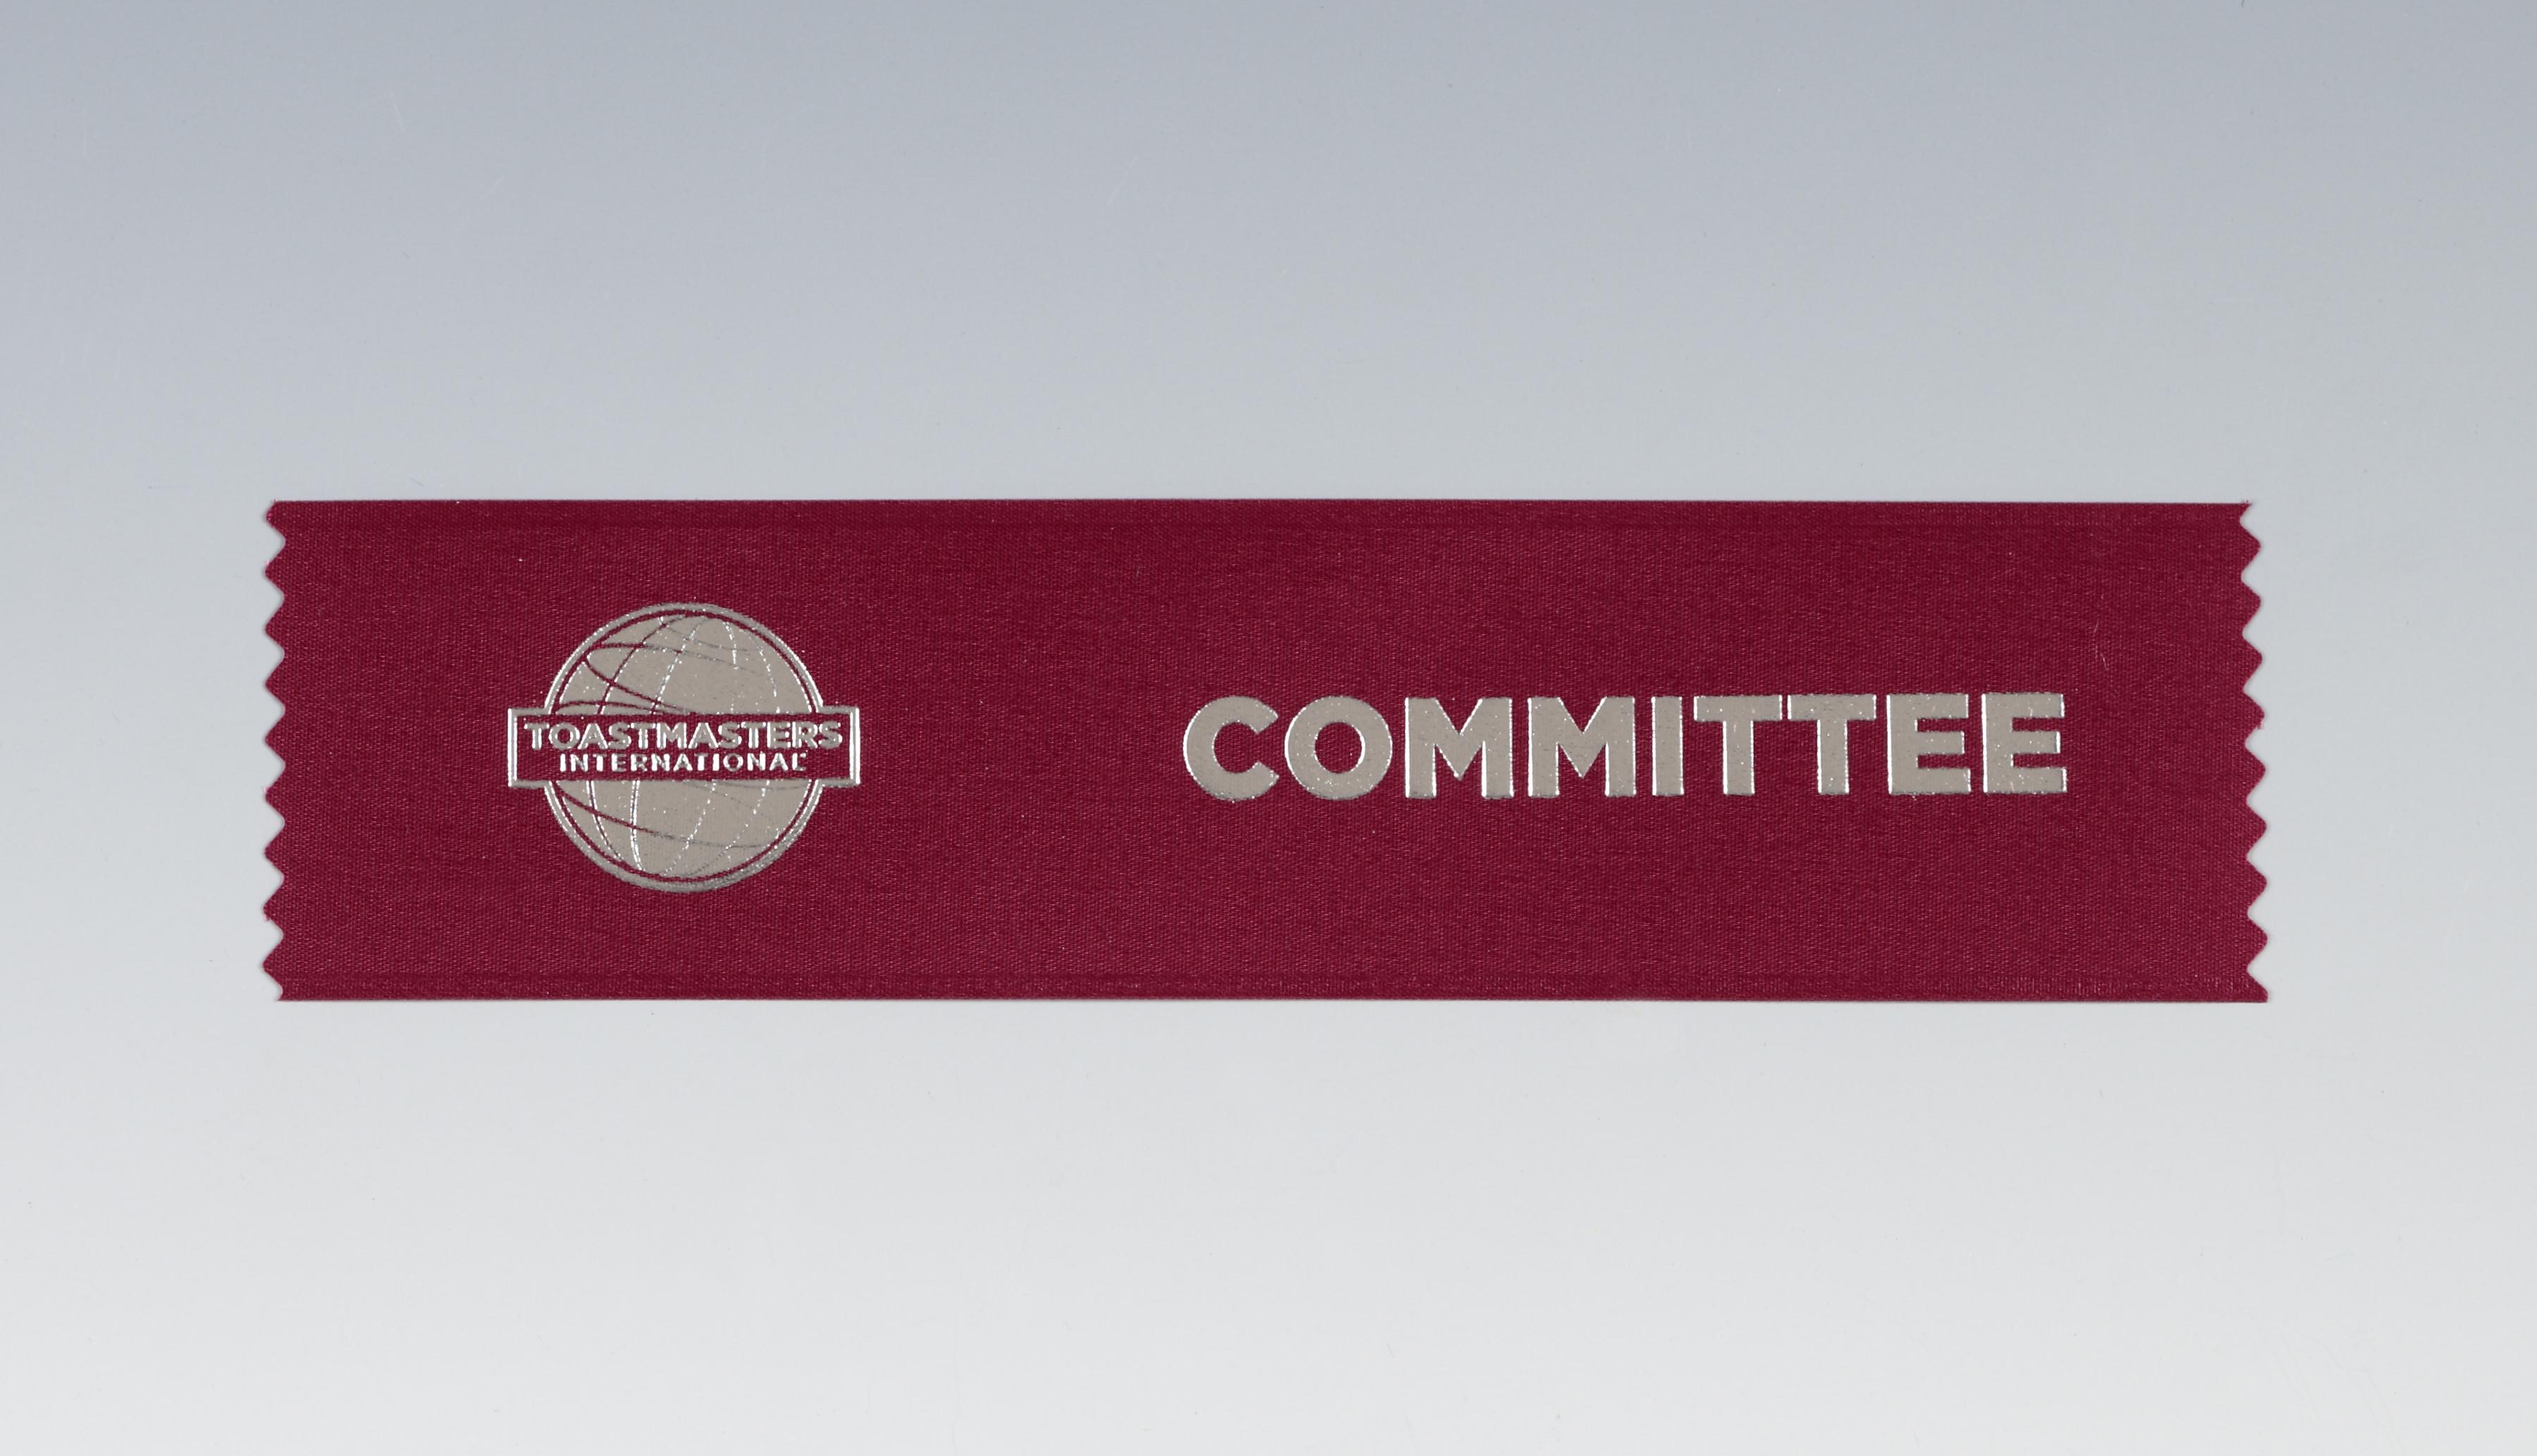 Committee Ribbon